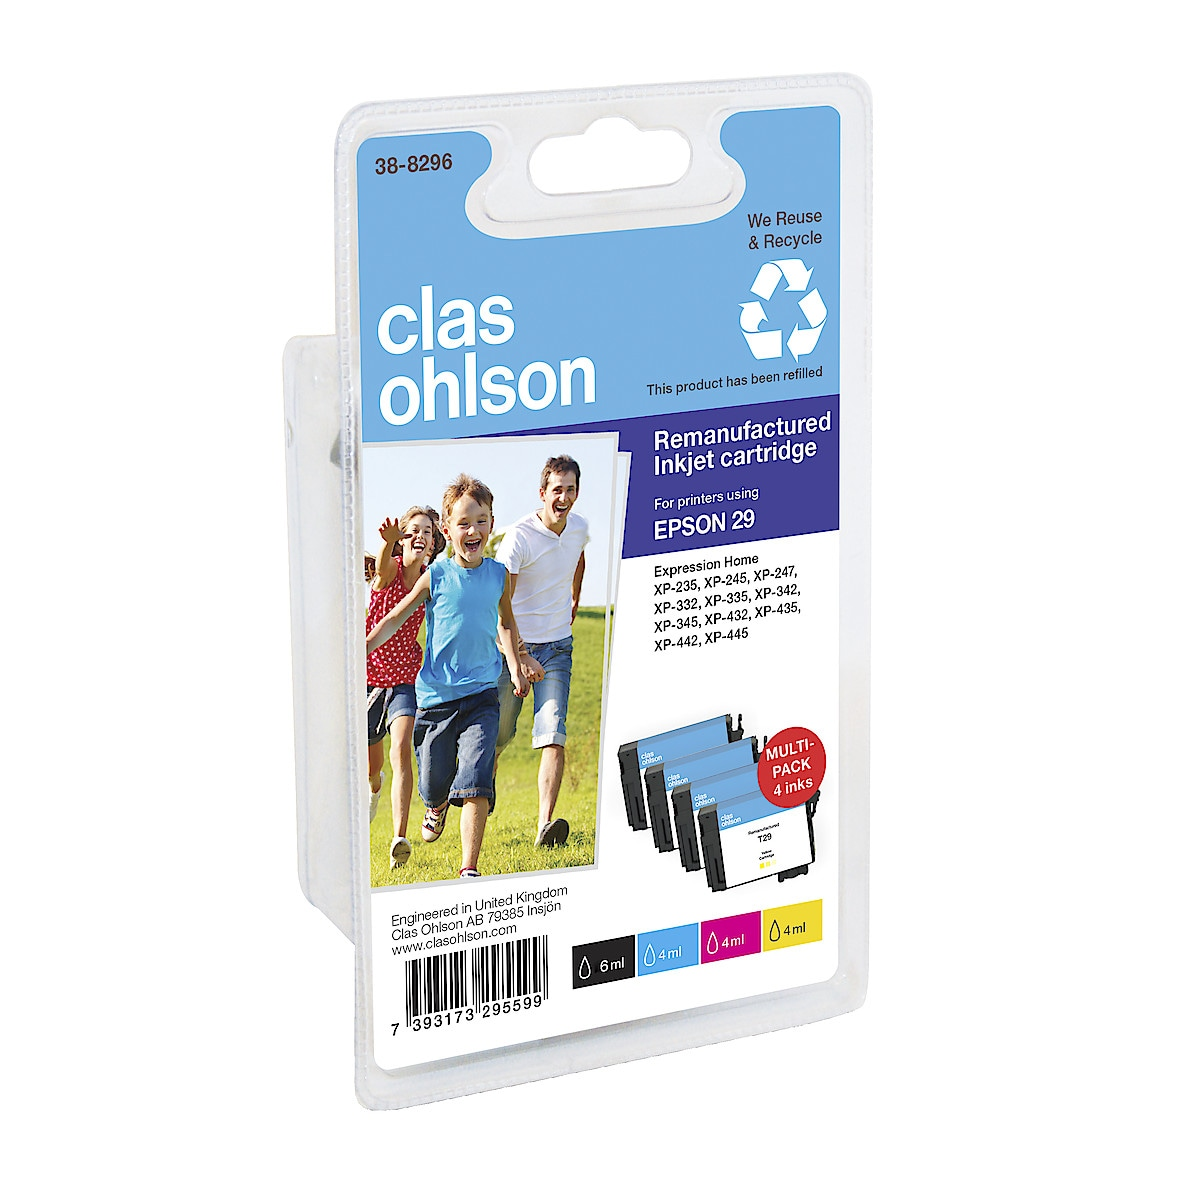 Bläckpatron Epson 29 Clas Ohlson